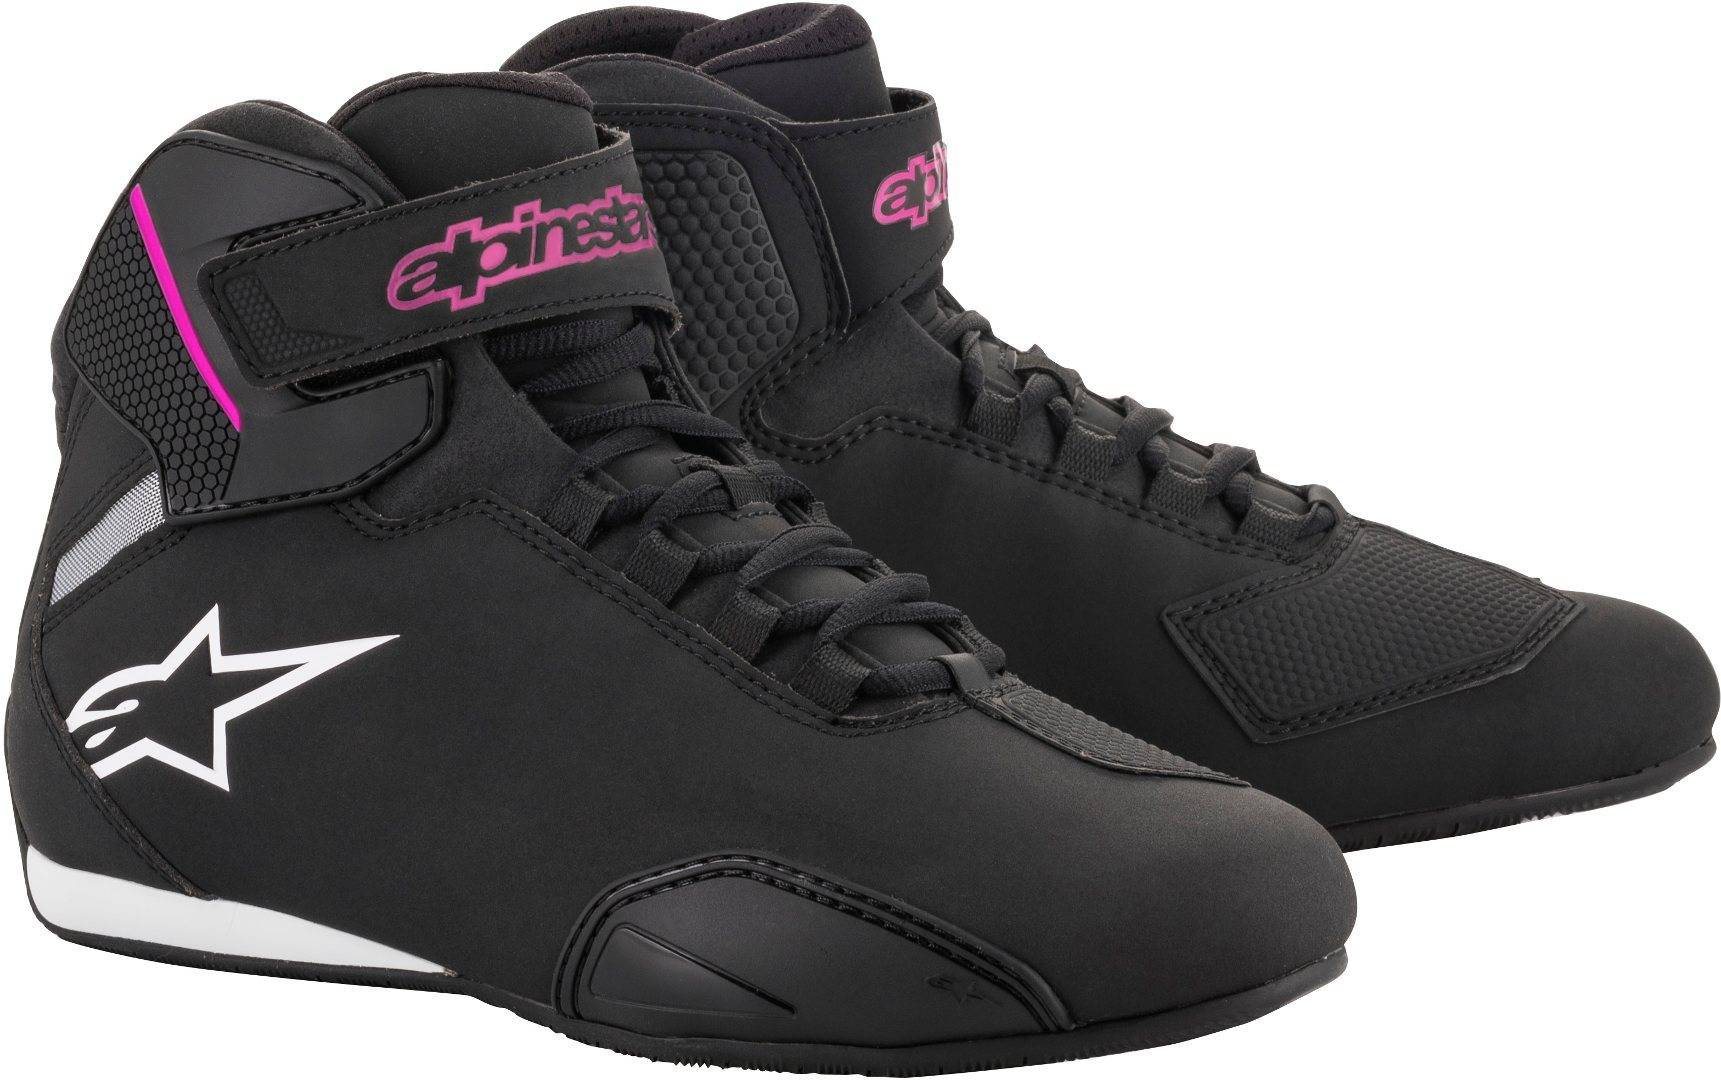 Alpinestars Stella Sektor Ladies Motorcycle Shoes Black Pink 36